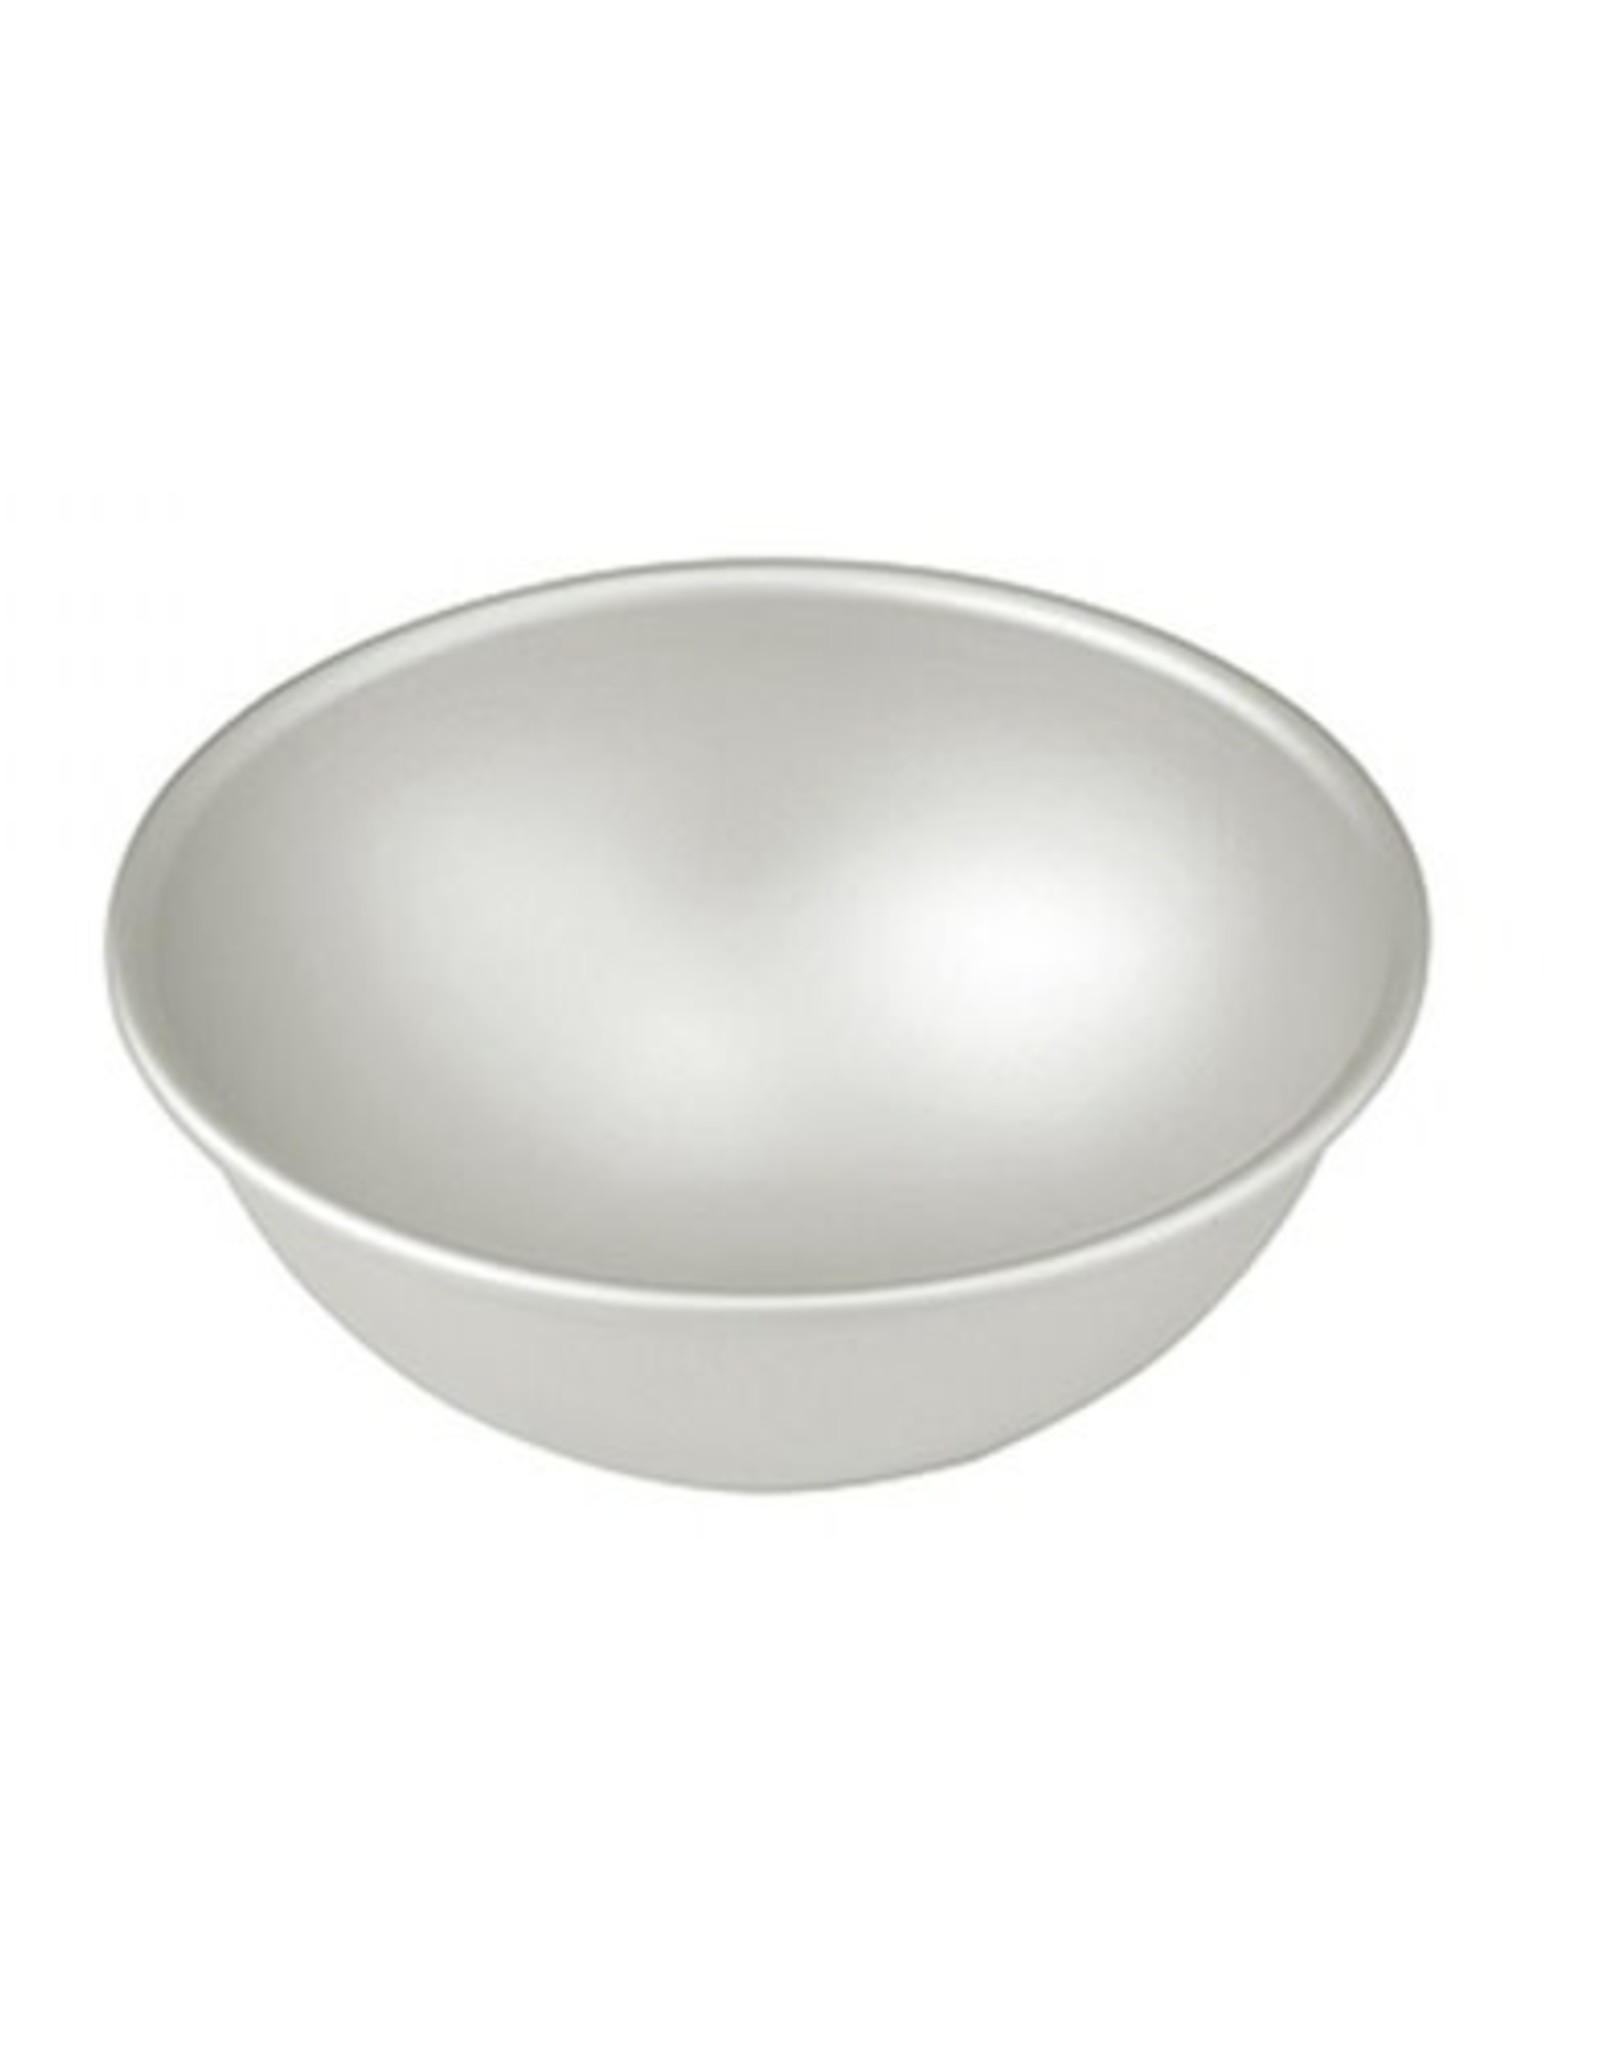 Fat Daddio's Fat Daddio's ProSeries Ball Pan (Hemisphere) -Ø25cm-